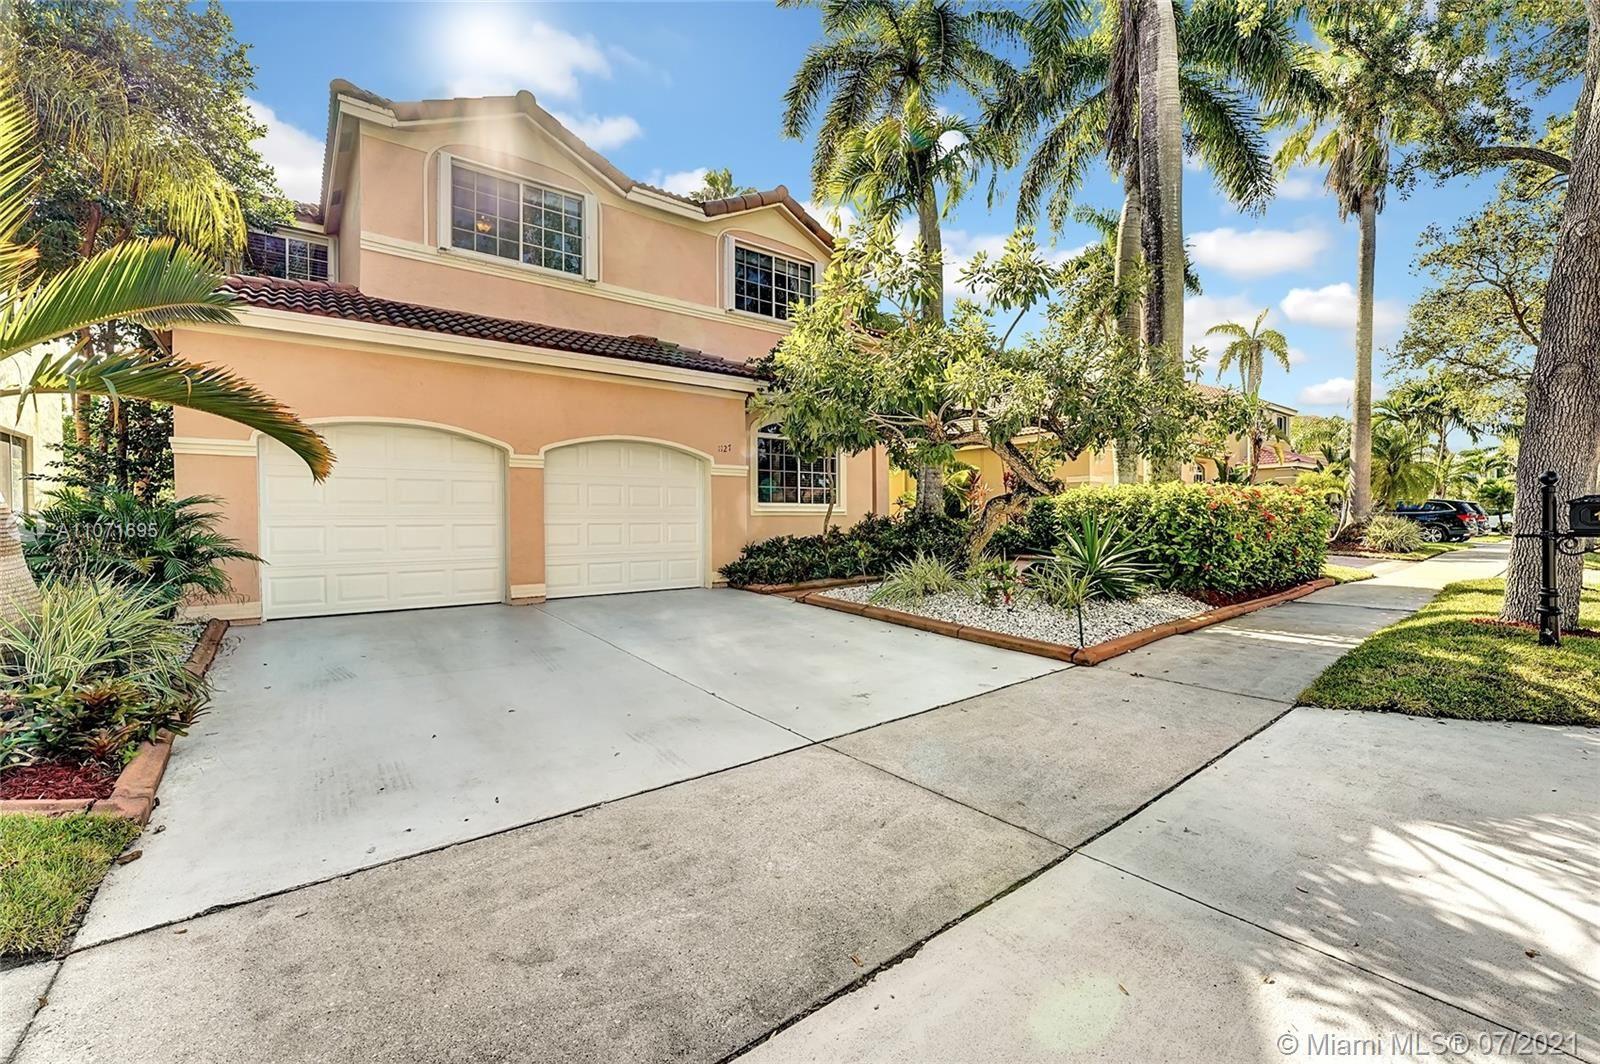 Photo of 1127 Camellia Cir, Weston, FL 33326 (MLS # A11071695)